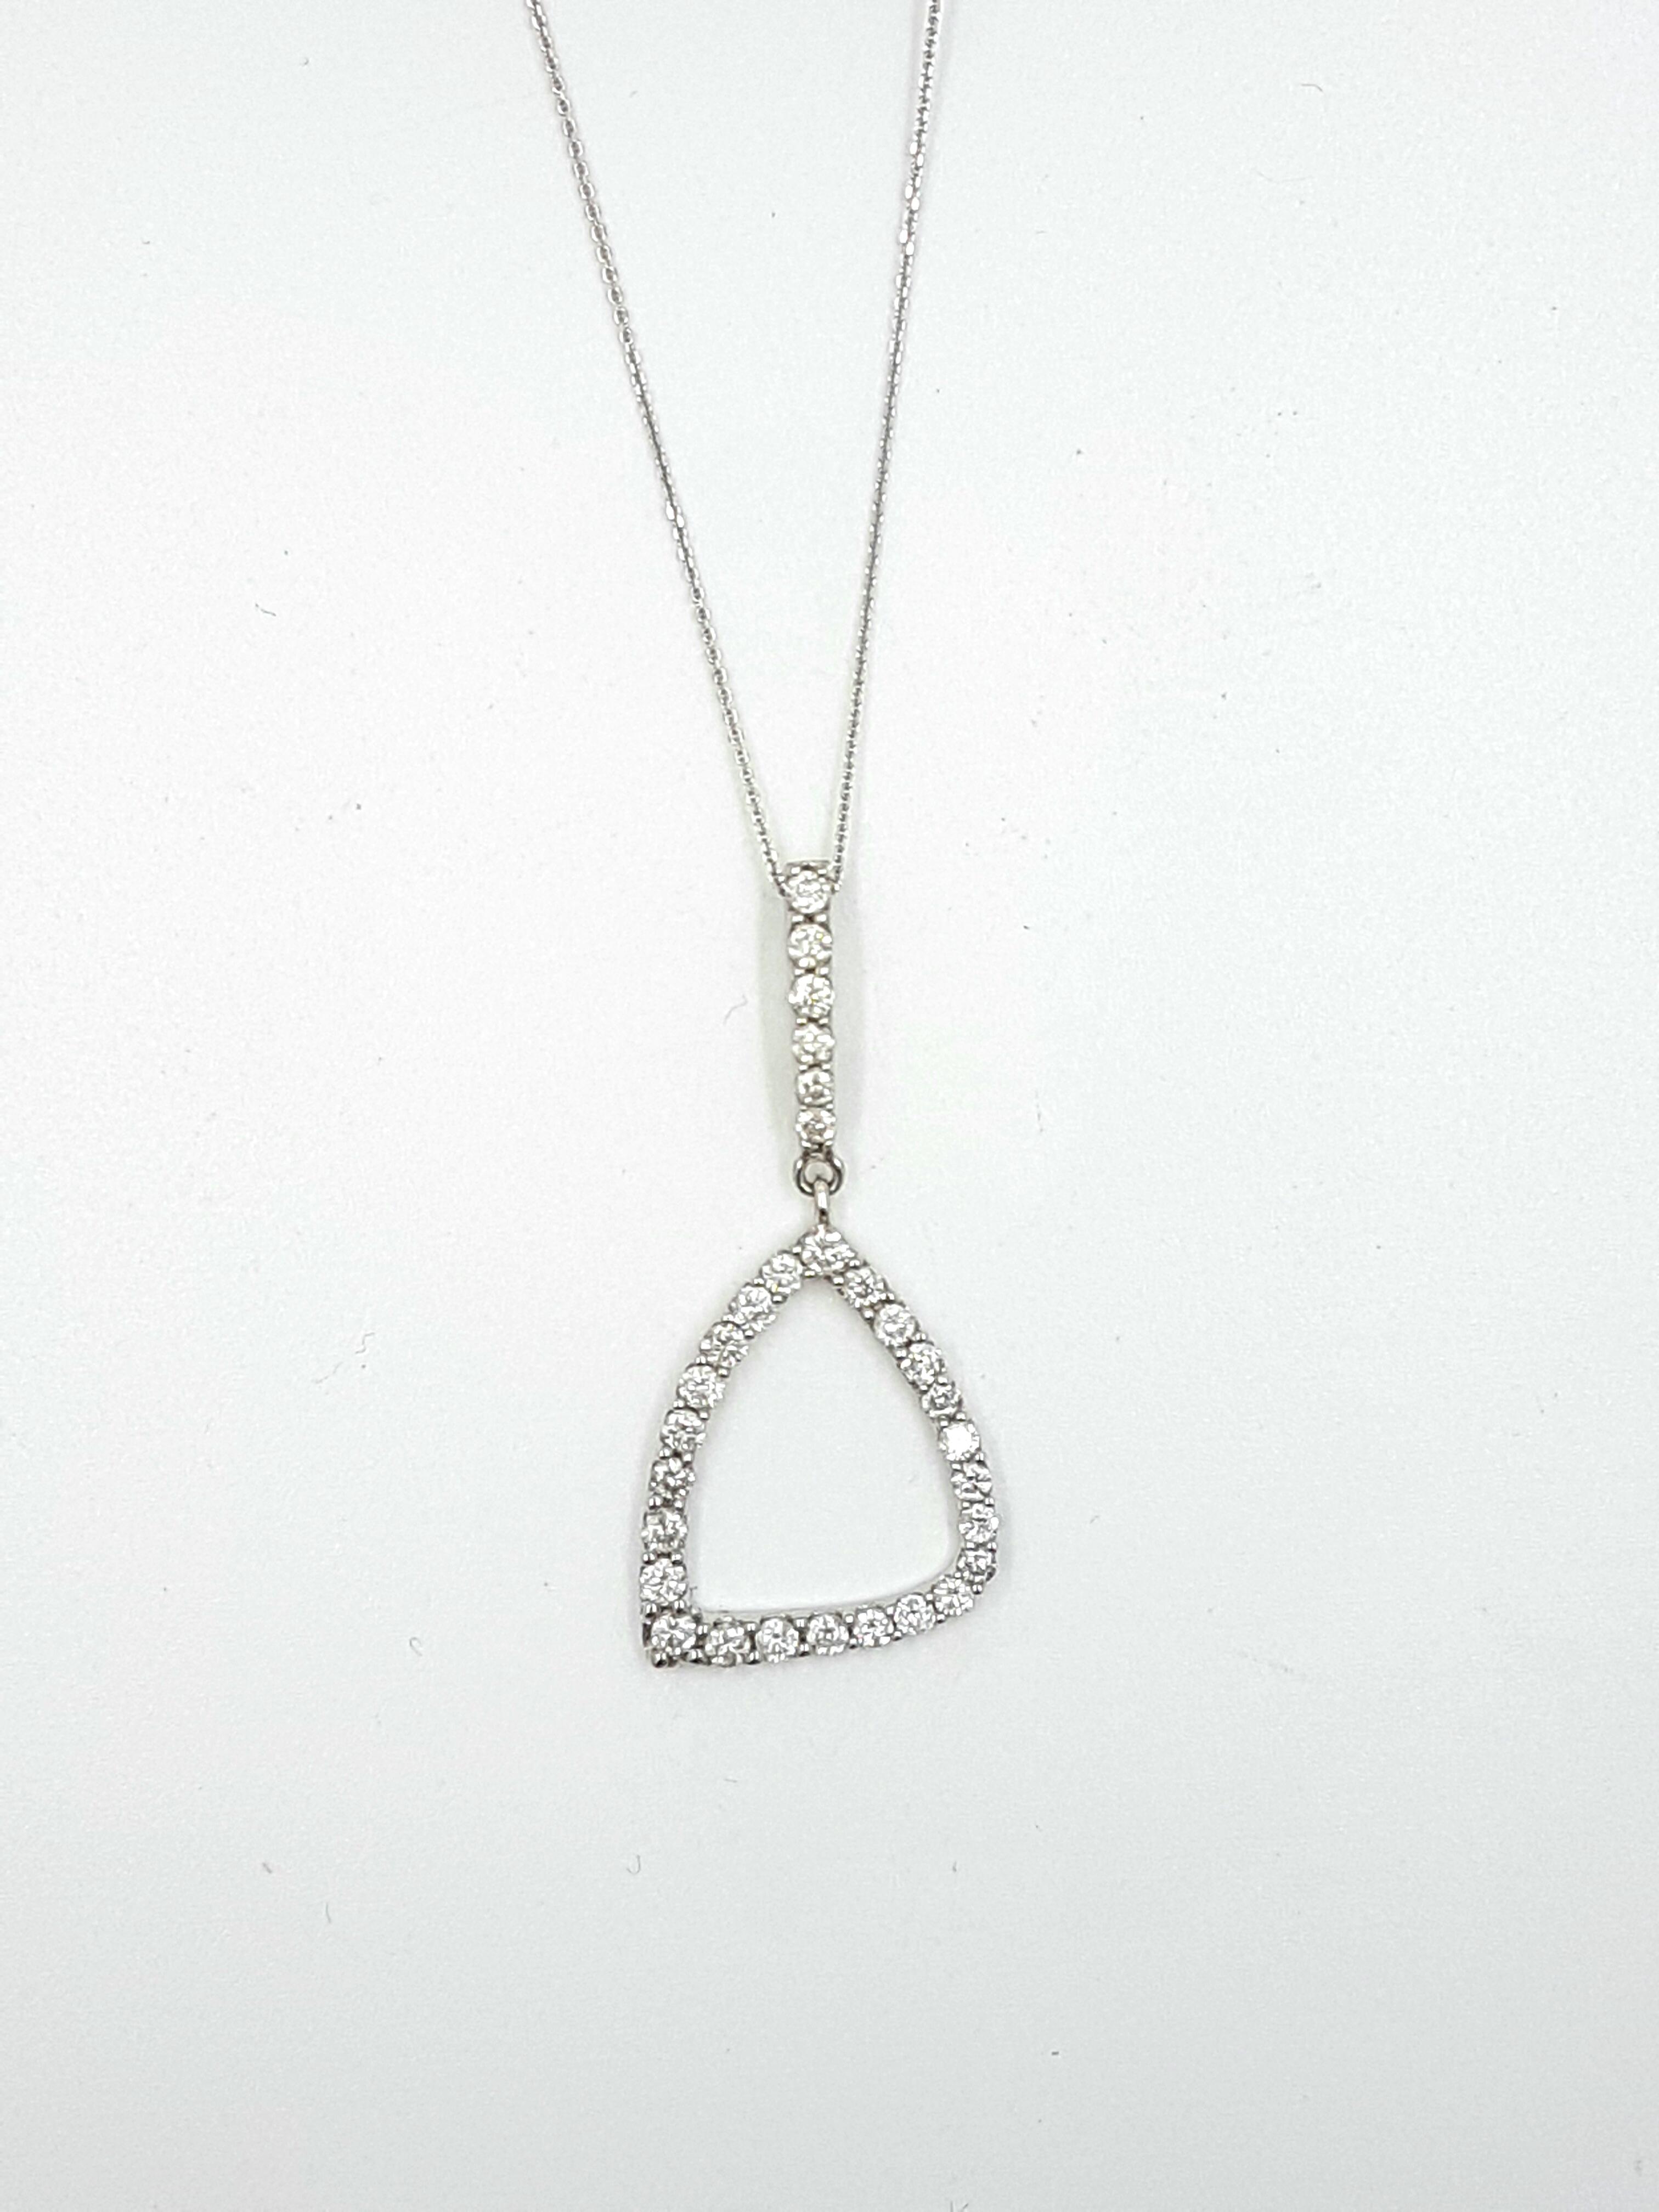 14K White Gold 1.00ct Regular Price $4275 SALE $895 Ref: GP659